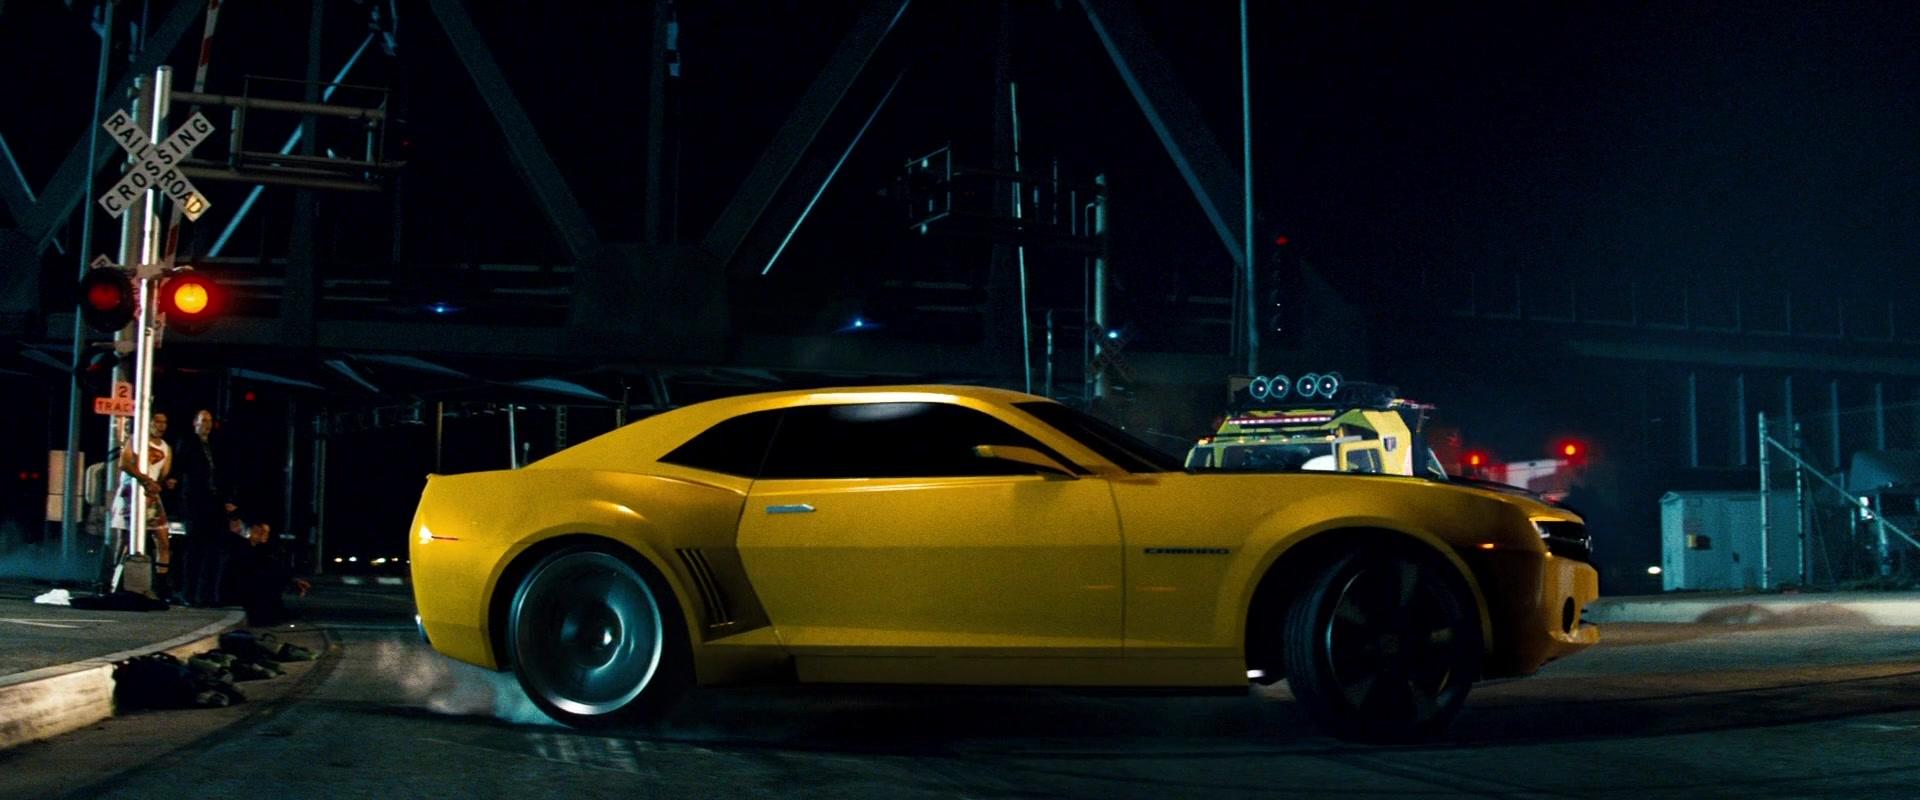 List Of Car Brands >> Chevrolet Camaro Yellow Car in Transformers (2007) Movie